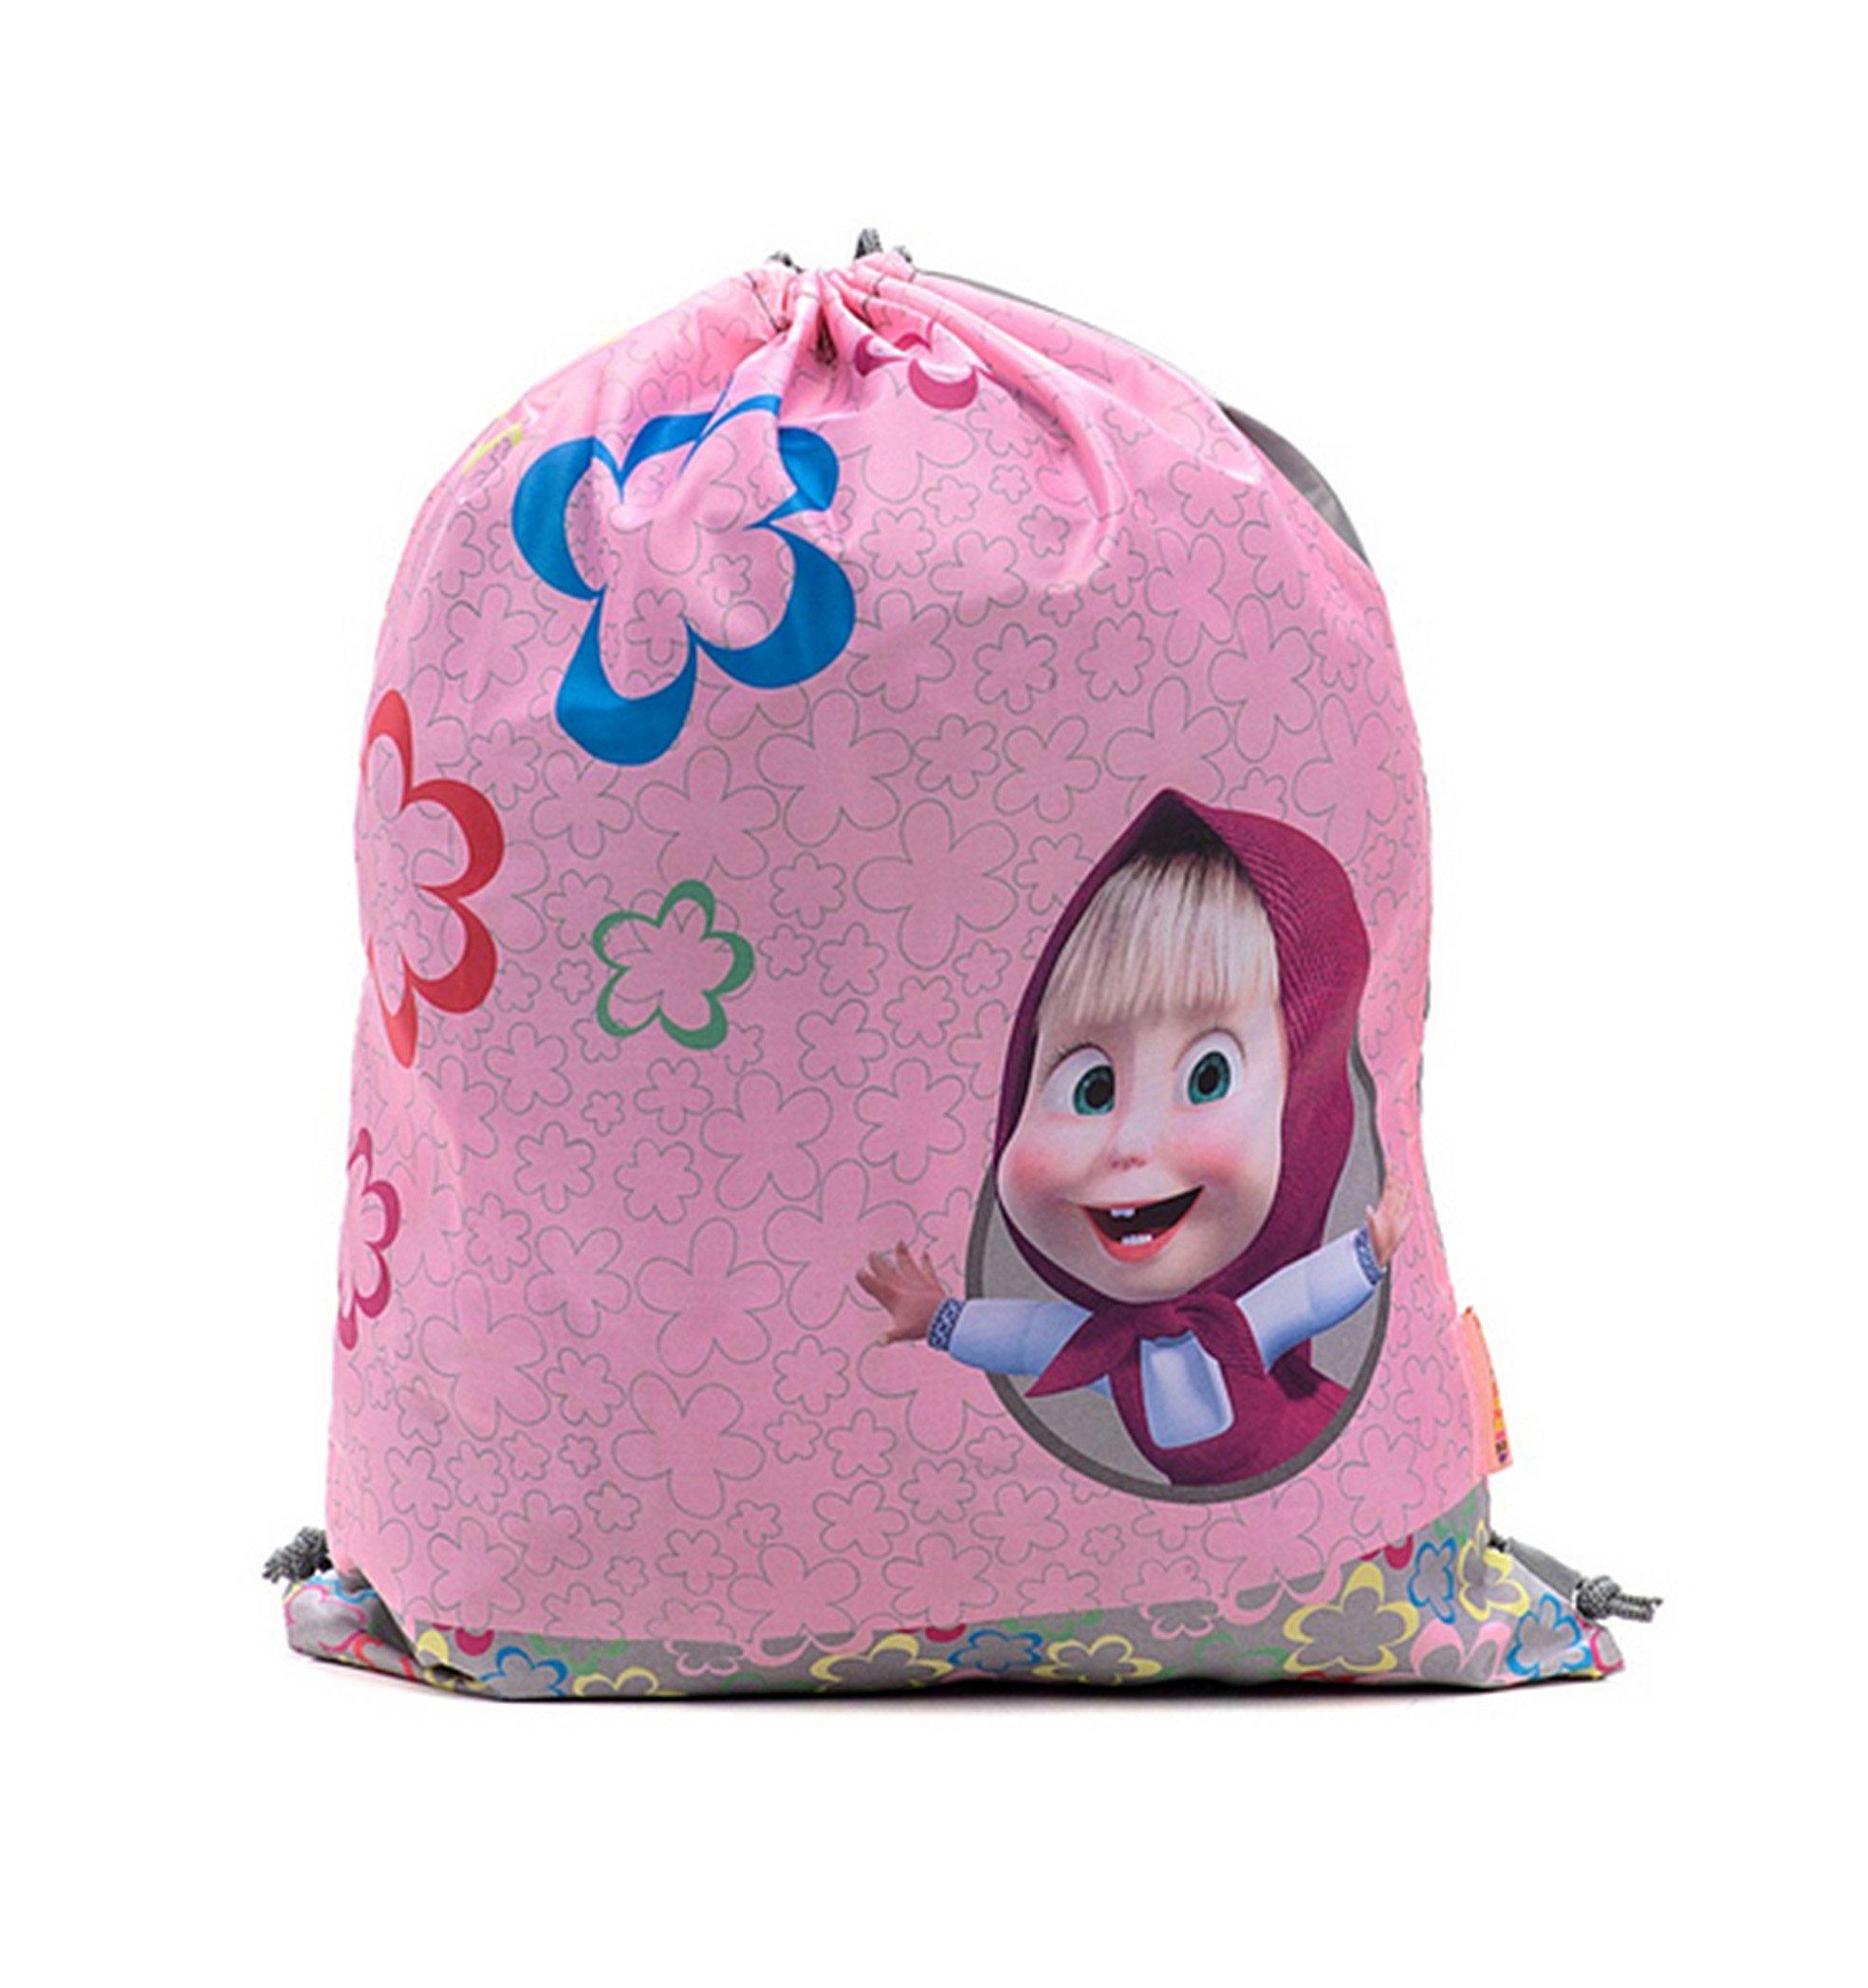 Bag for Shoes Masha and the Bear Backpack Bag (9inch) E Orso Kindergarten for Baby Preschool Bag Masha and the Bear, Baby Bag, Small Backpack Kids Cute Backpack Kindergarten Little Girl Rose Gray